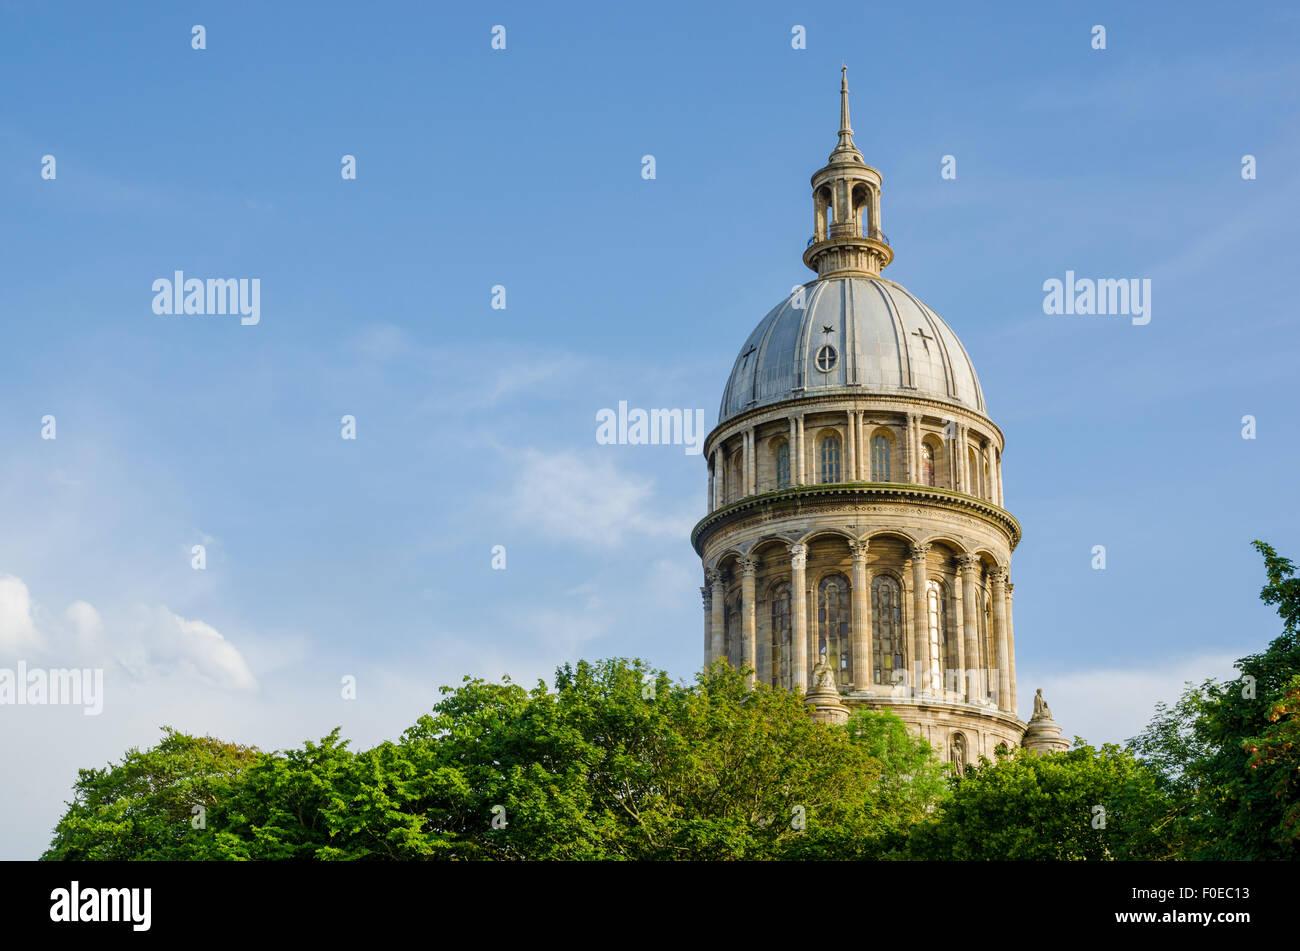 The Basilica of Notre-Dame de Boulogne in Boulogne-sur-Mer, France - Stock Image